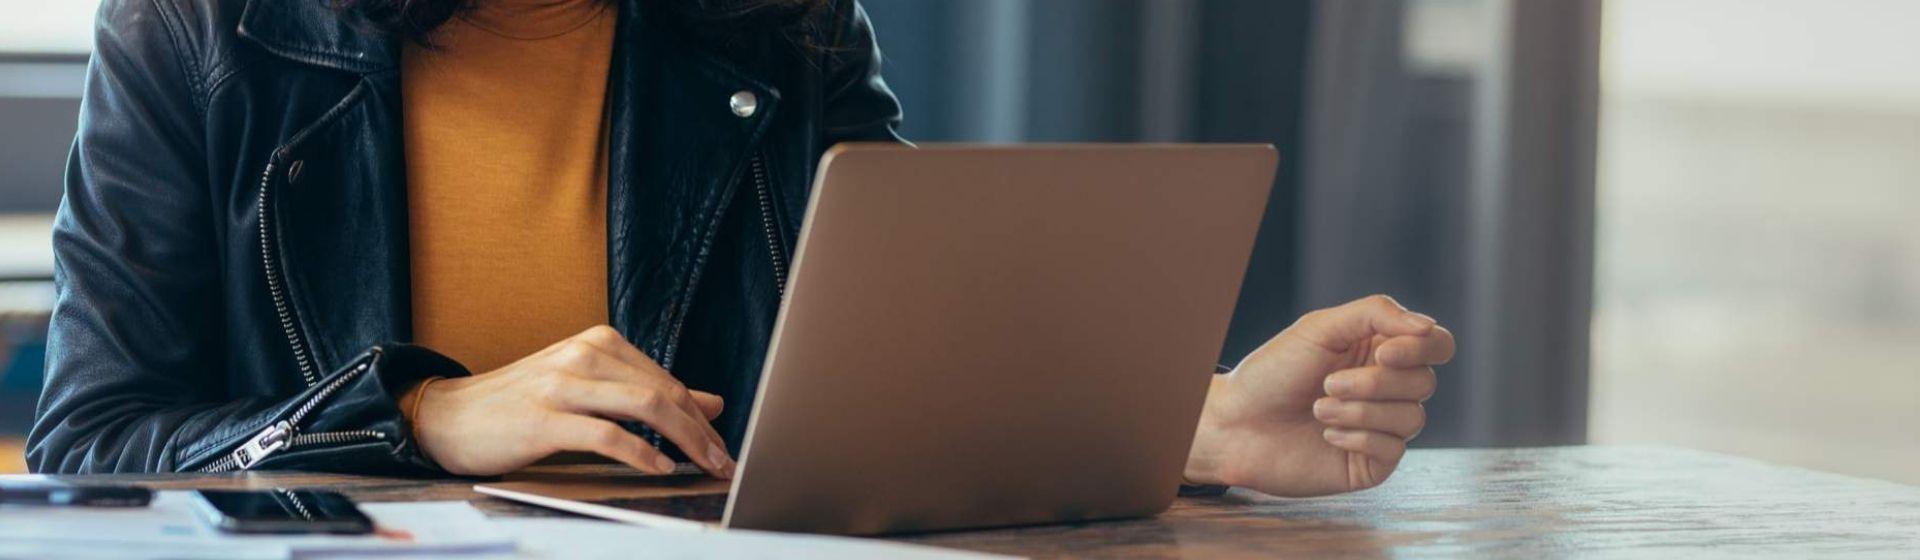 Como formatar notebook Positivo? Aprenda no tutorial